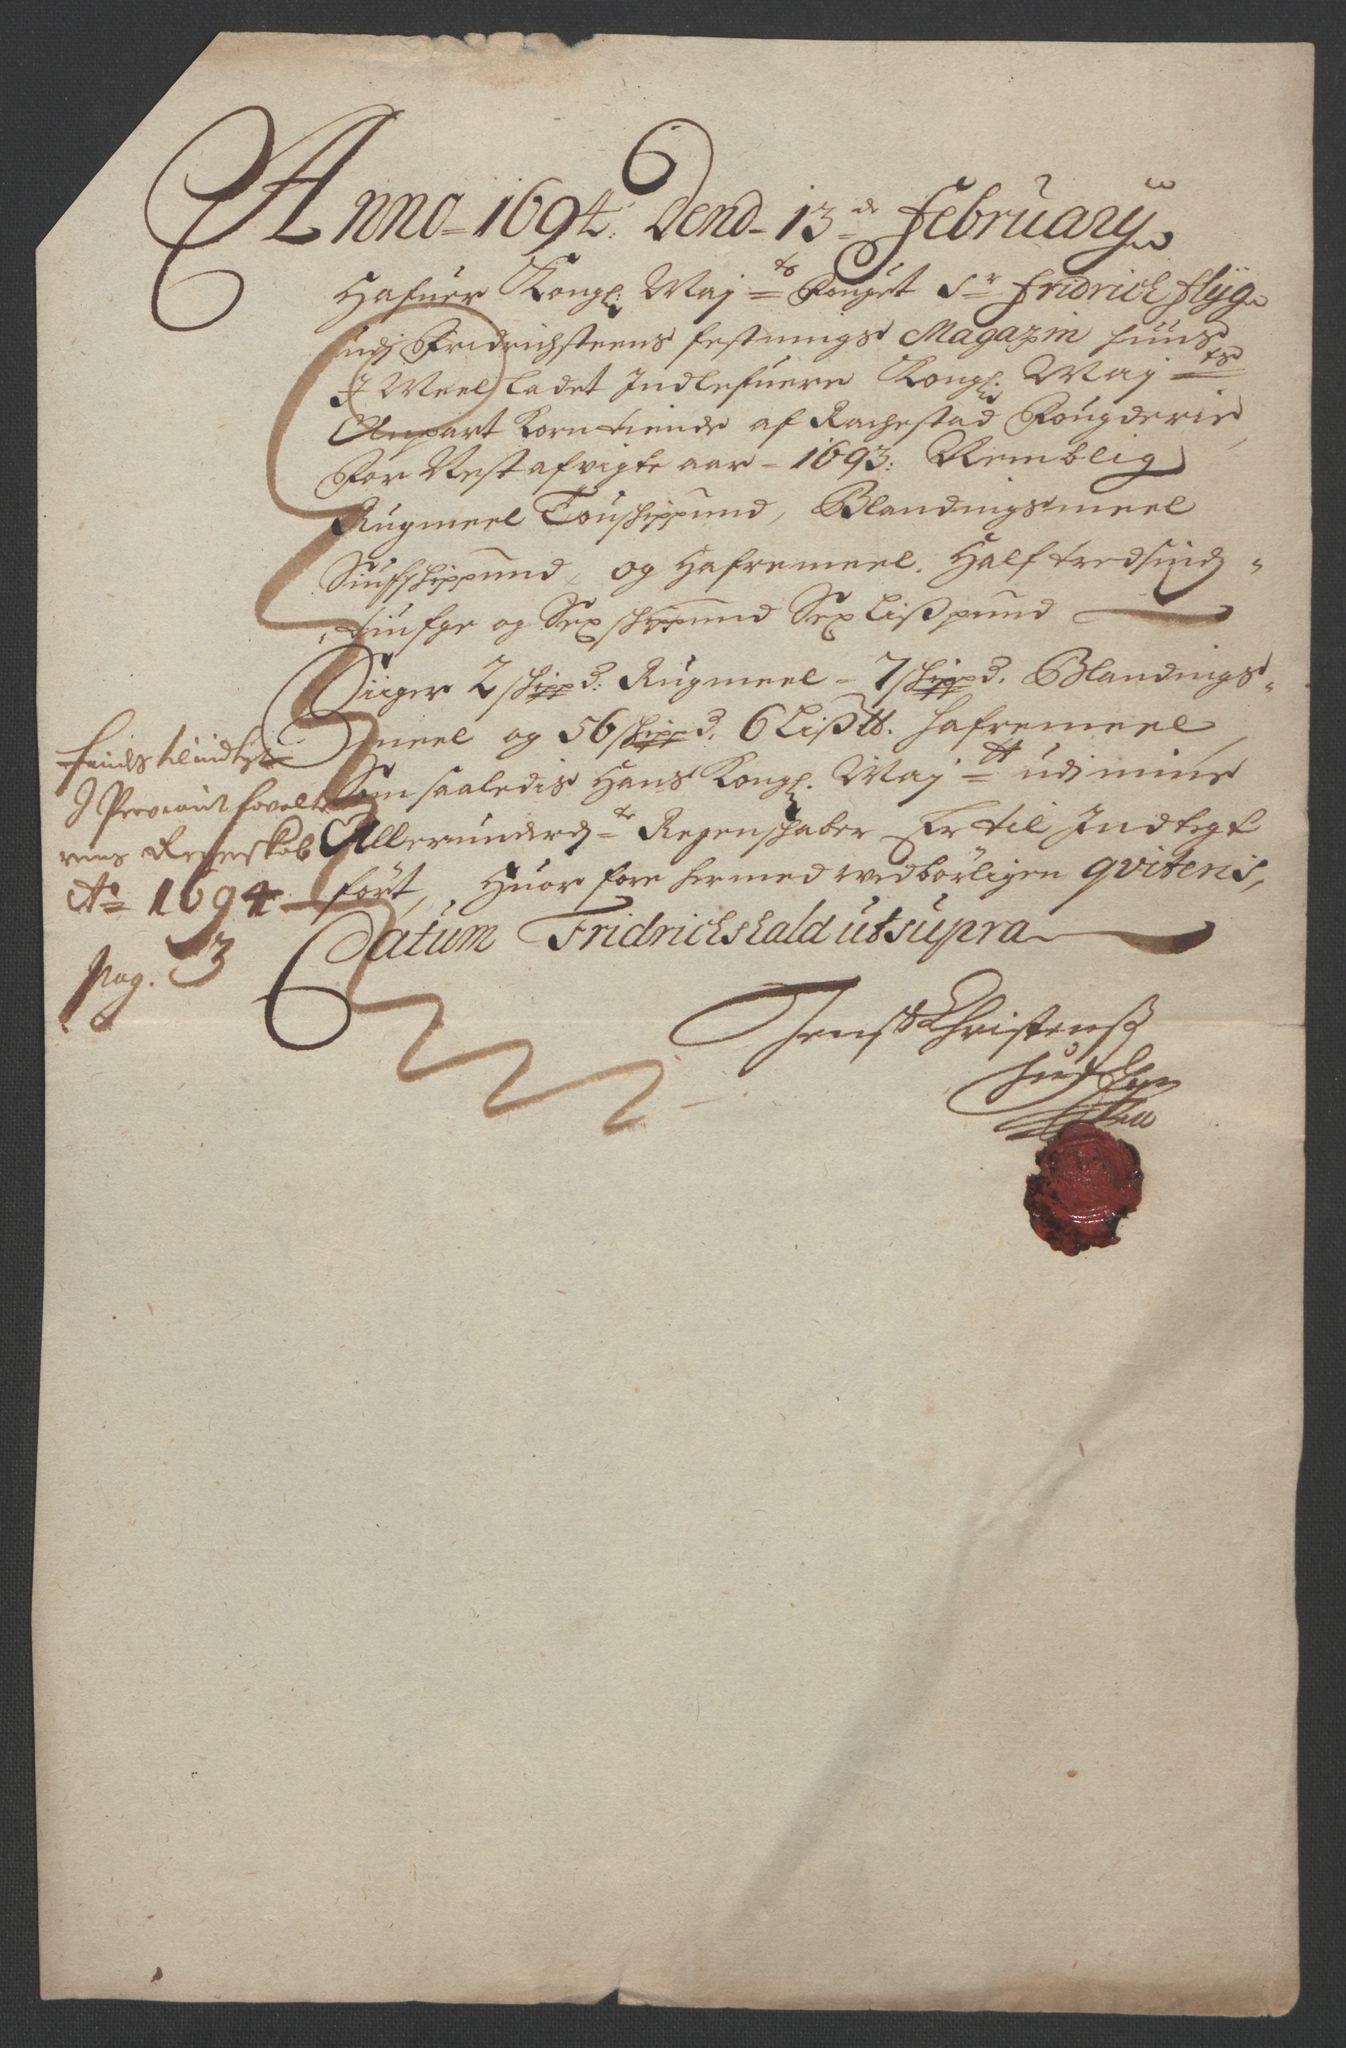 RA, Rentekammeret inntil 1814, Reviderte regnskaper, Fogderegnskap, R05/L0278: Fogderegnskap Rakkestad, 1691-1693, s. 530